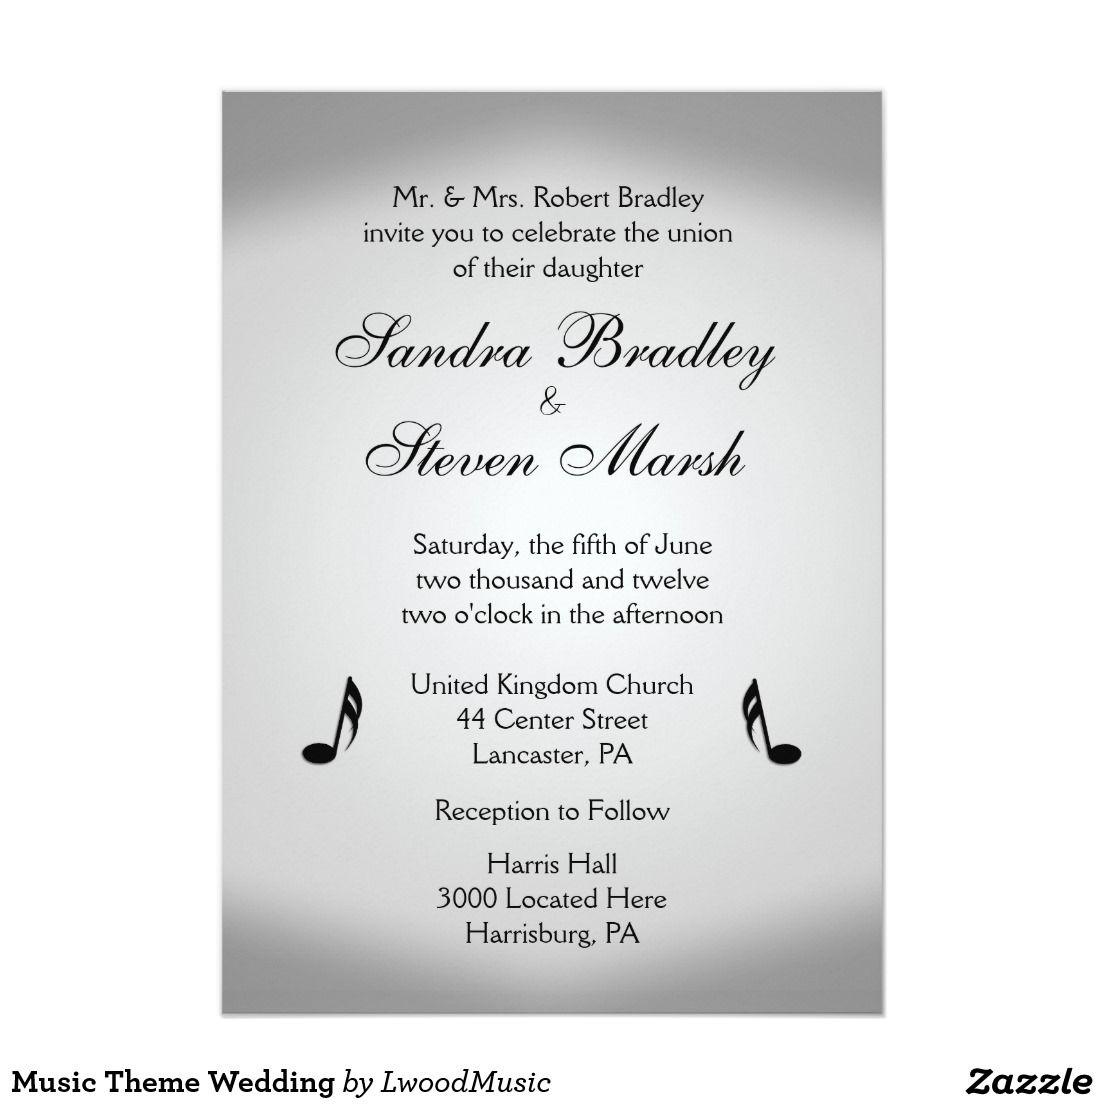 Silver Music Wedding Theme Invitation | Music wedding themes ...